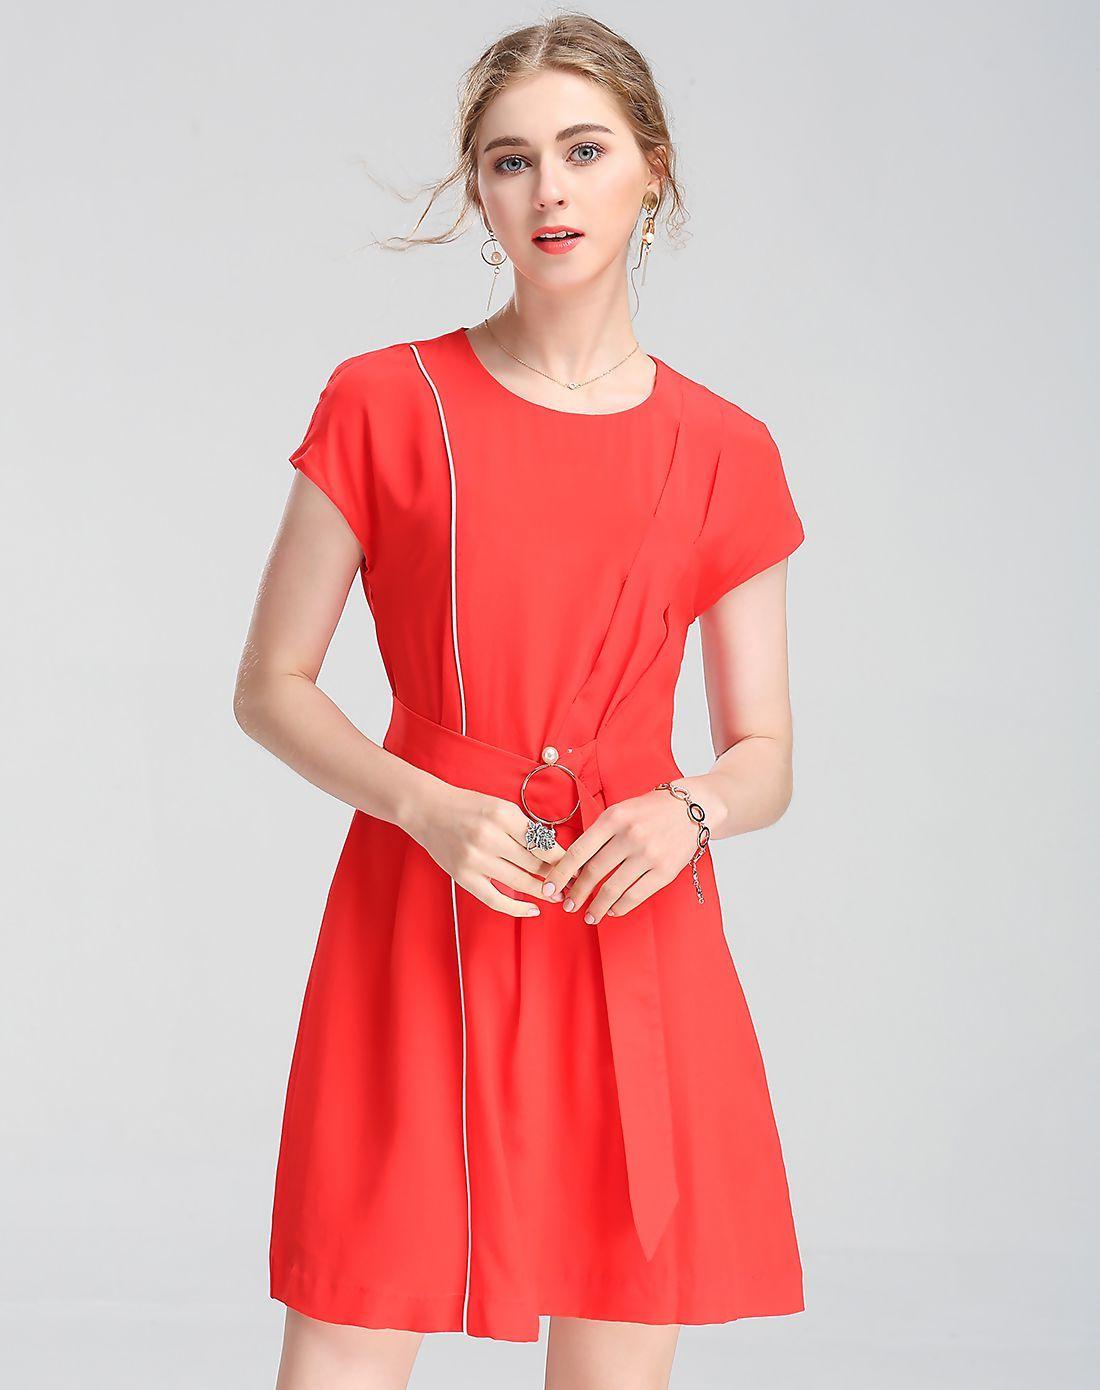 Viva vena red silk plain round neck tied aline mini dress reducbr